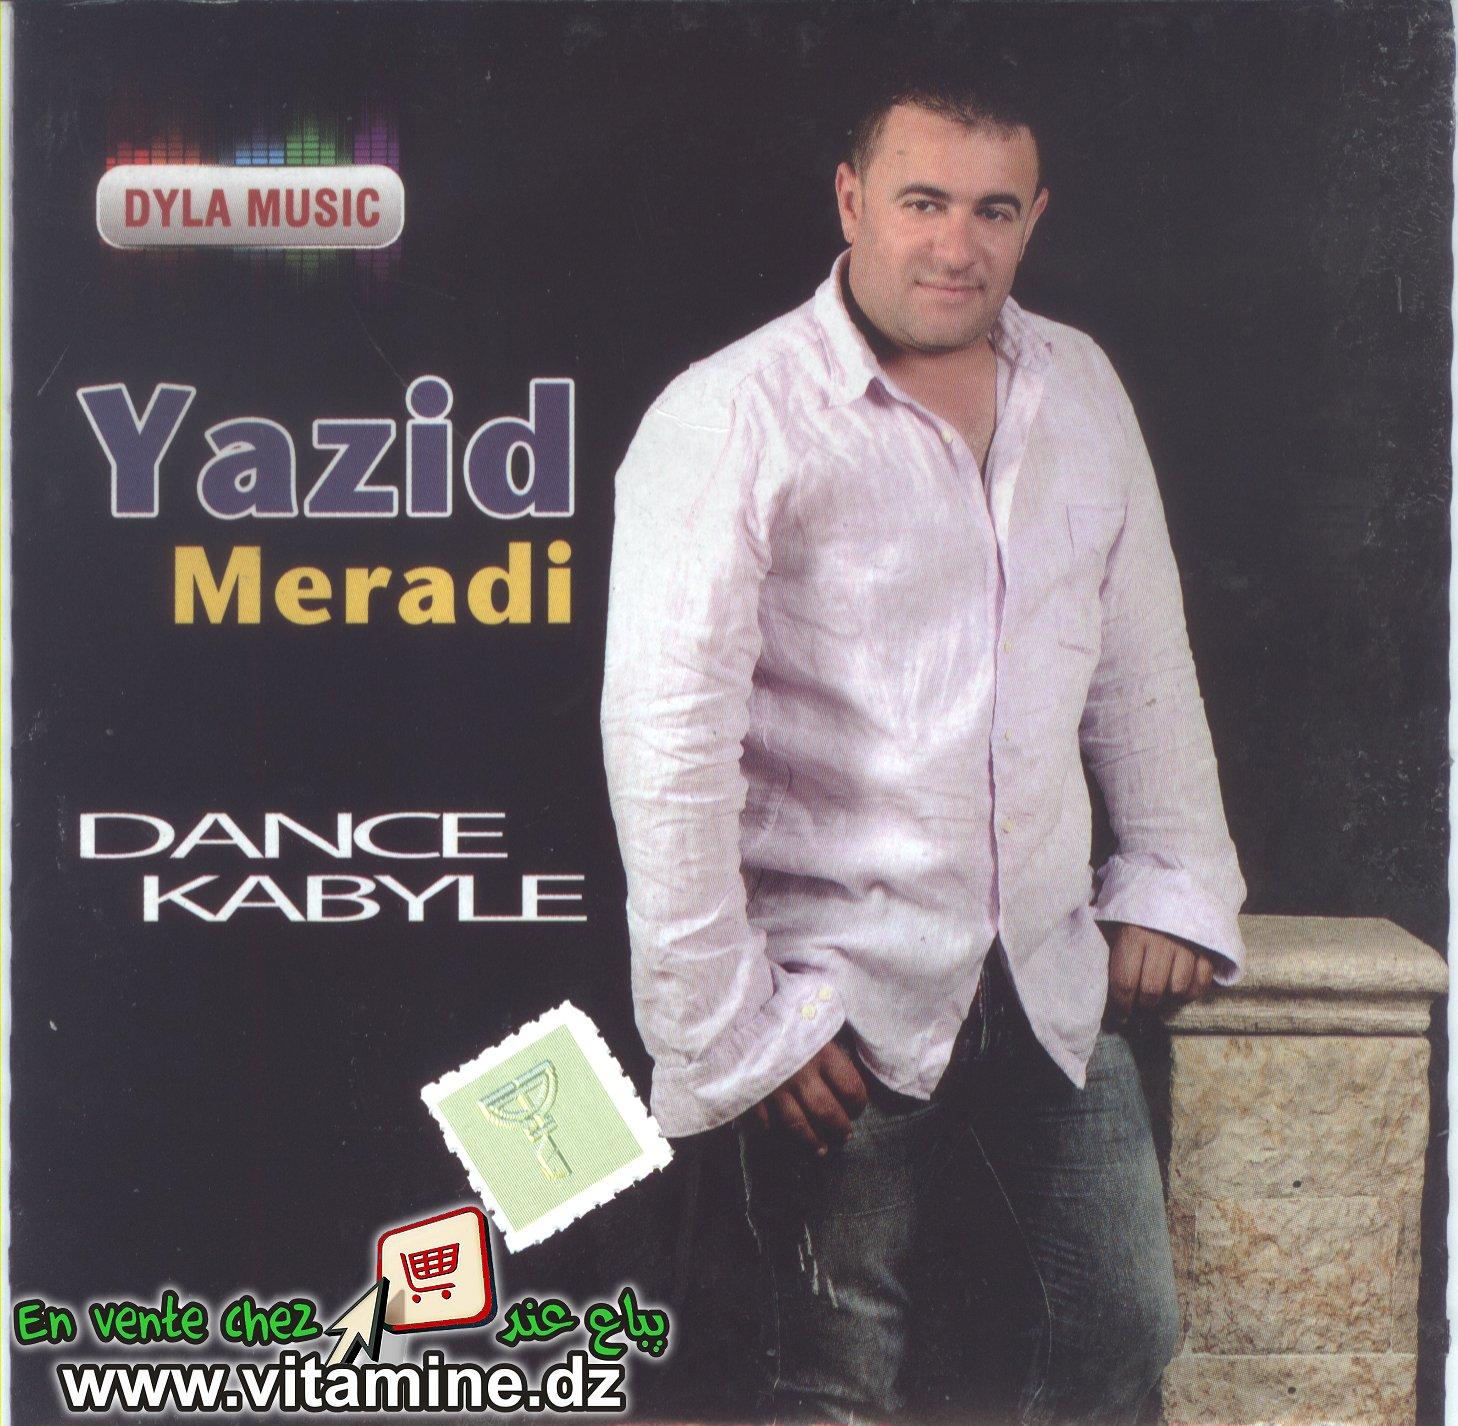 Yazid Meradi - dance kabyle